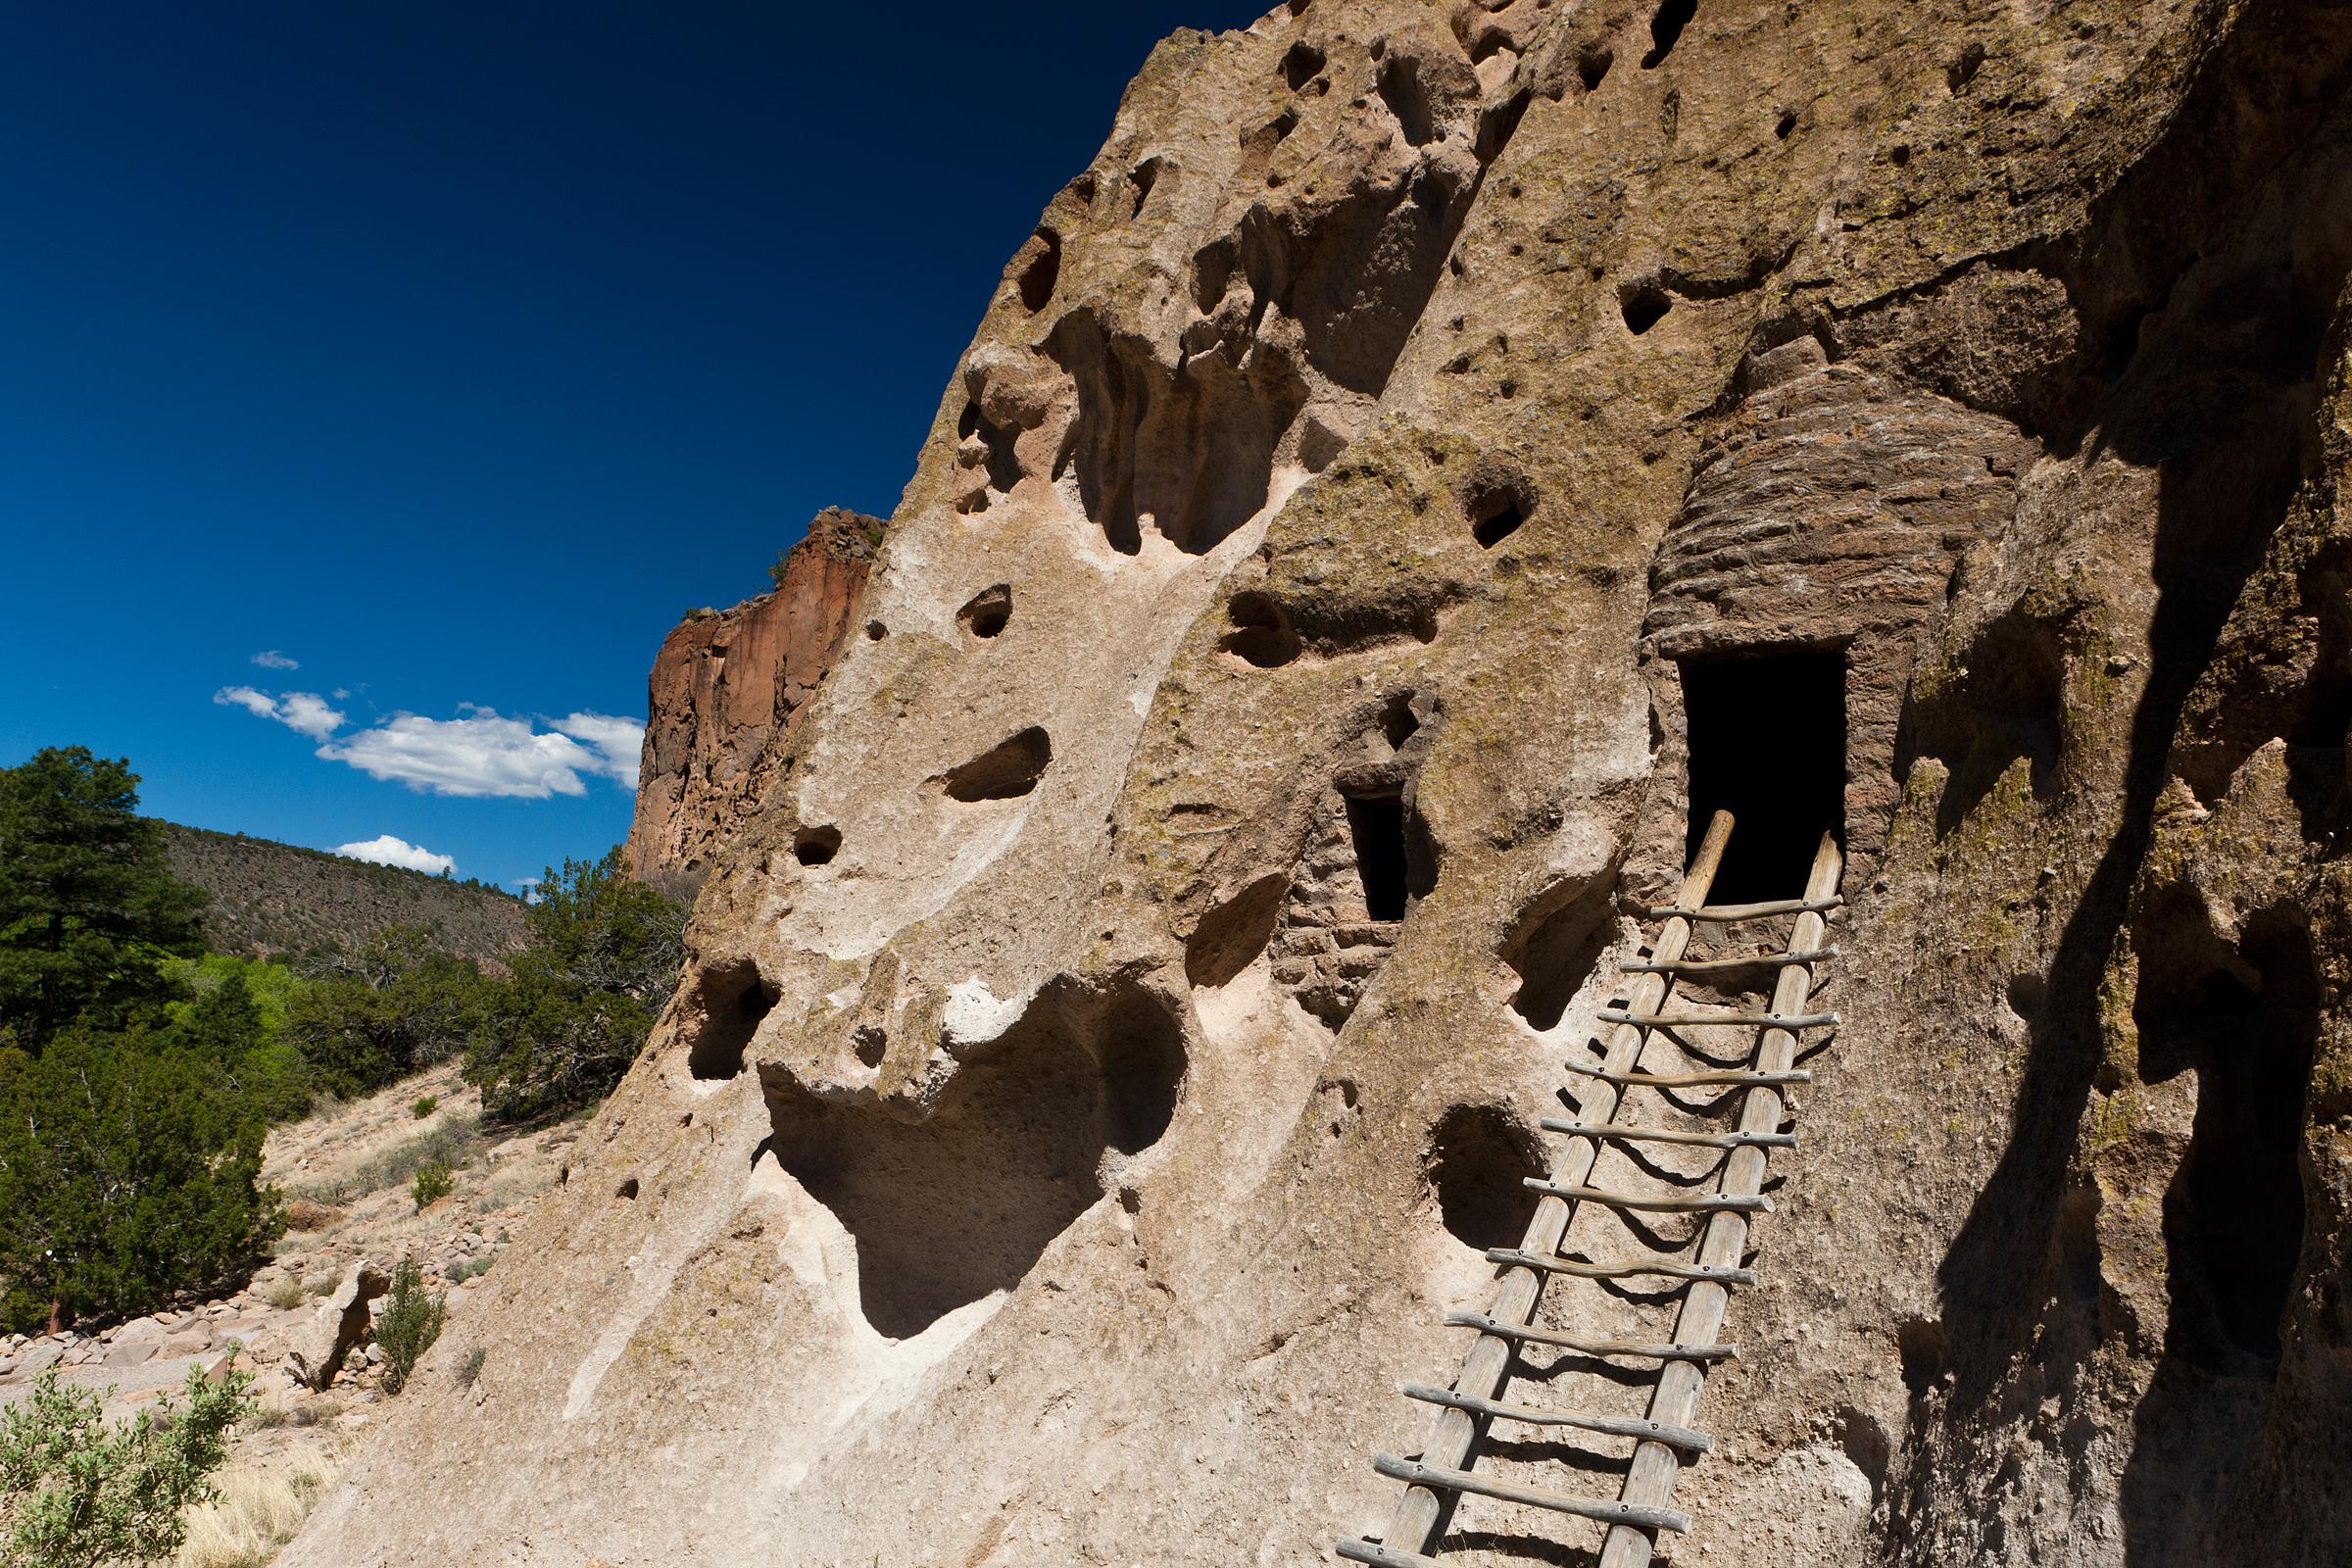 Bandelier National Monument in Los Alamos is an hour west of Santa Fe. Jennifer King